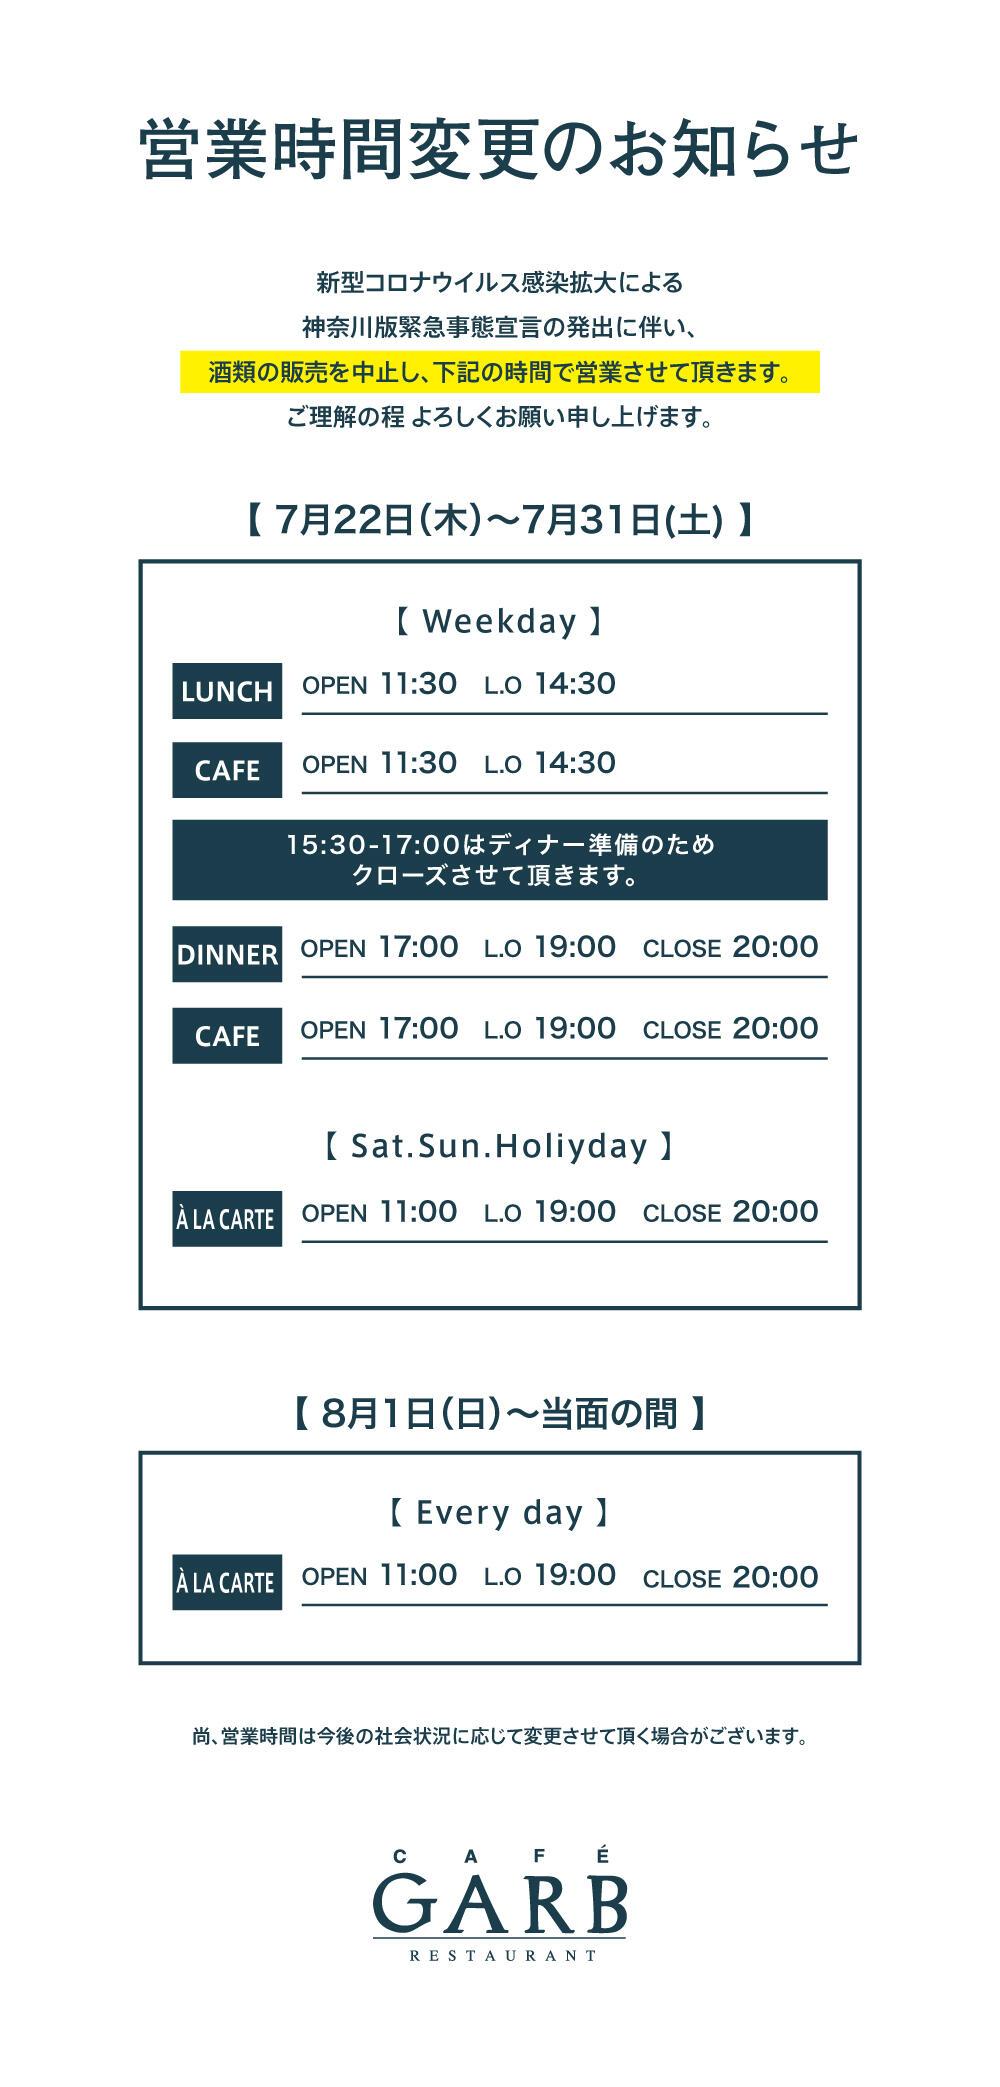 ge_210719_営業時間変更_main.jpg